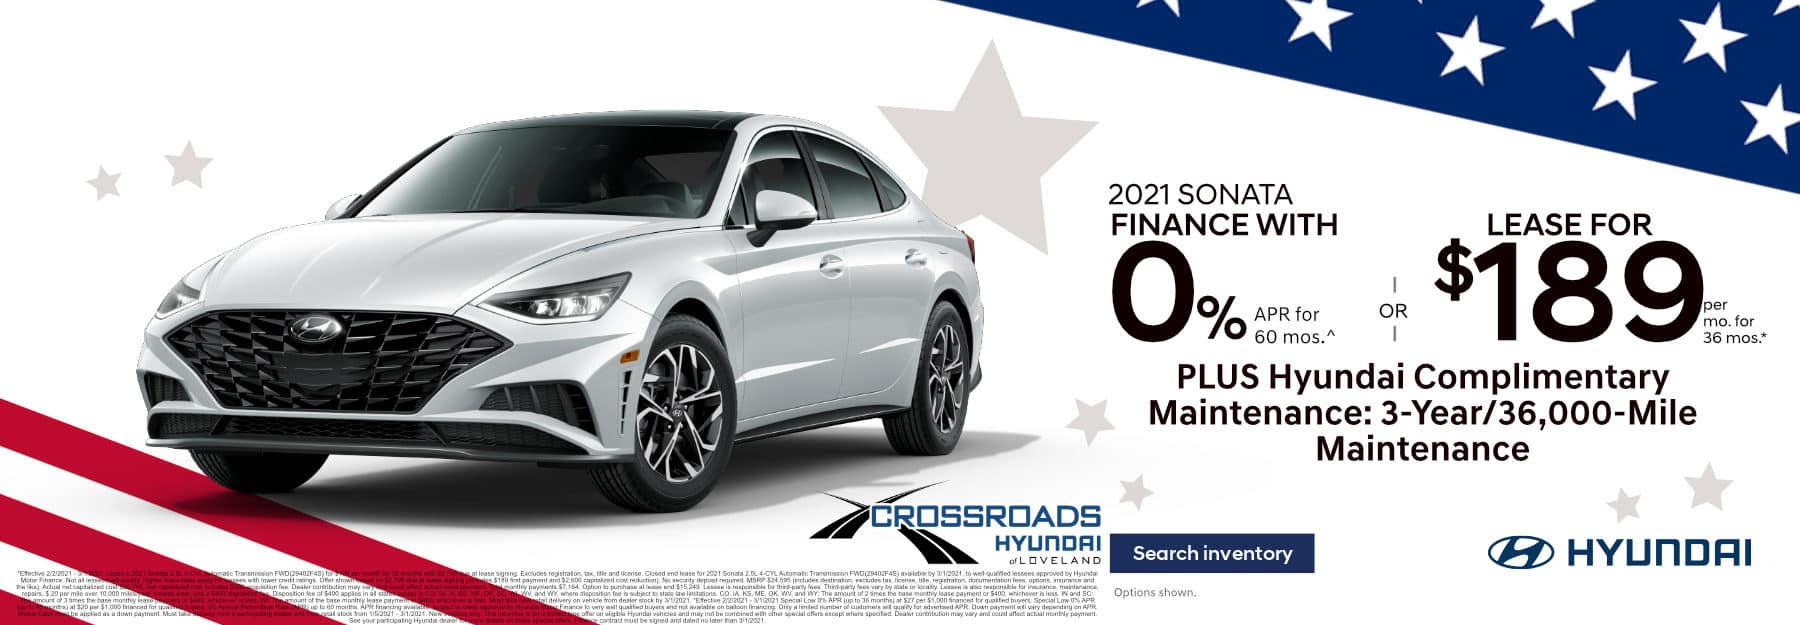 February_2021_Sonata_Crossroads_Hyundai